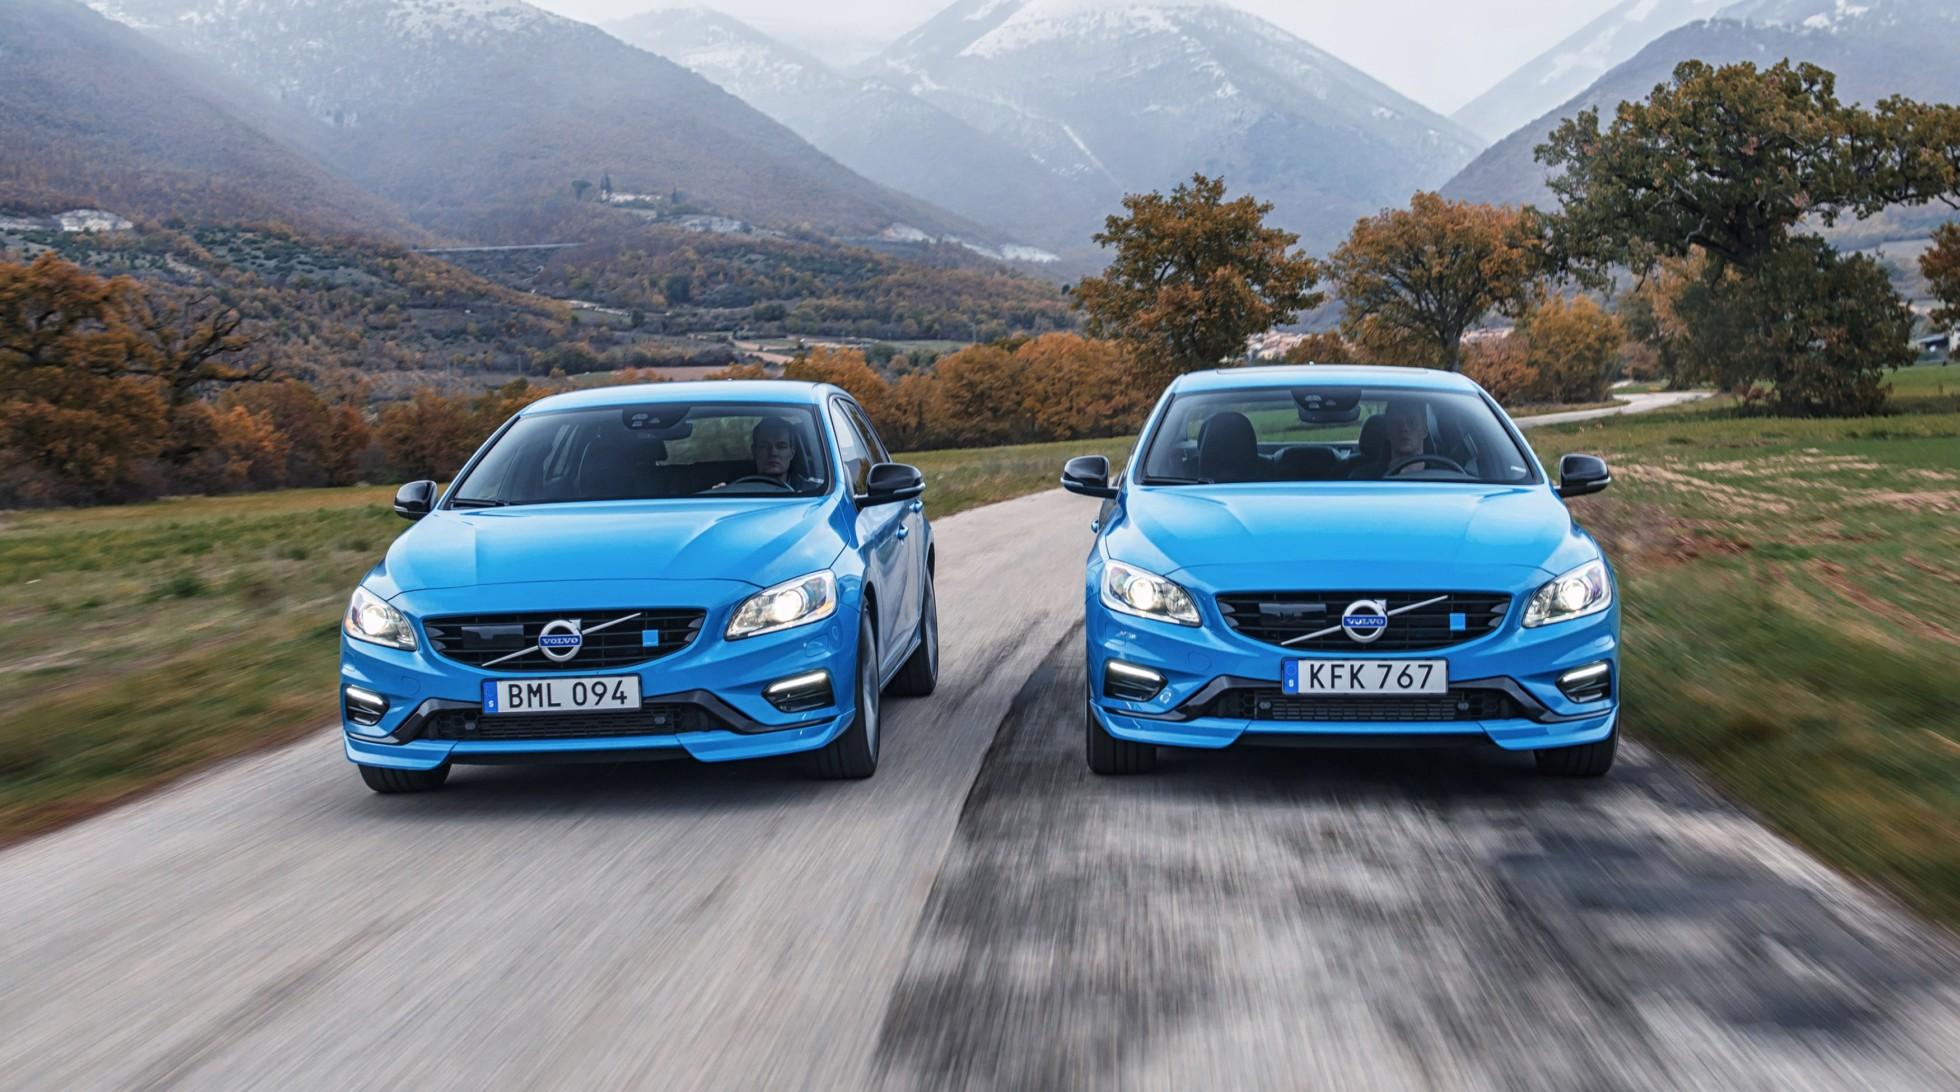 Налосанджелесском автосалоне представлены «заряженные» Volvo S60, атакже V60